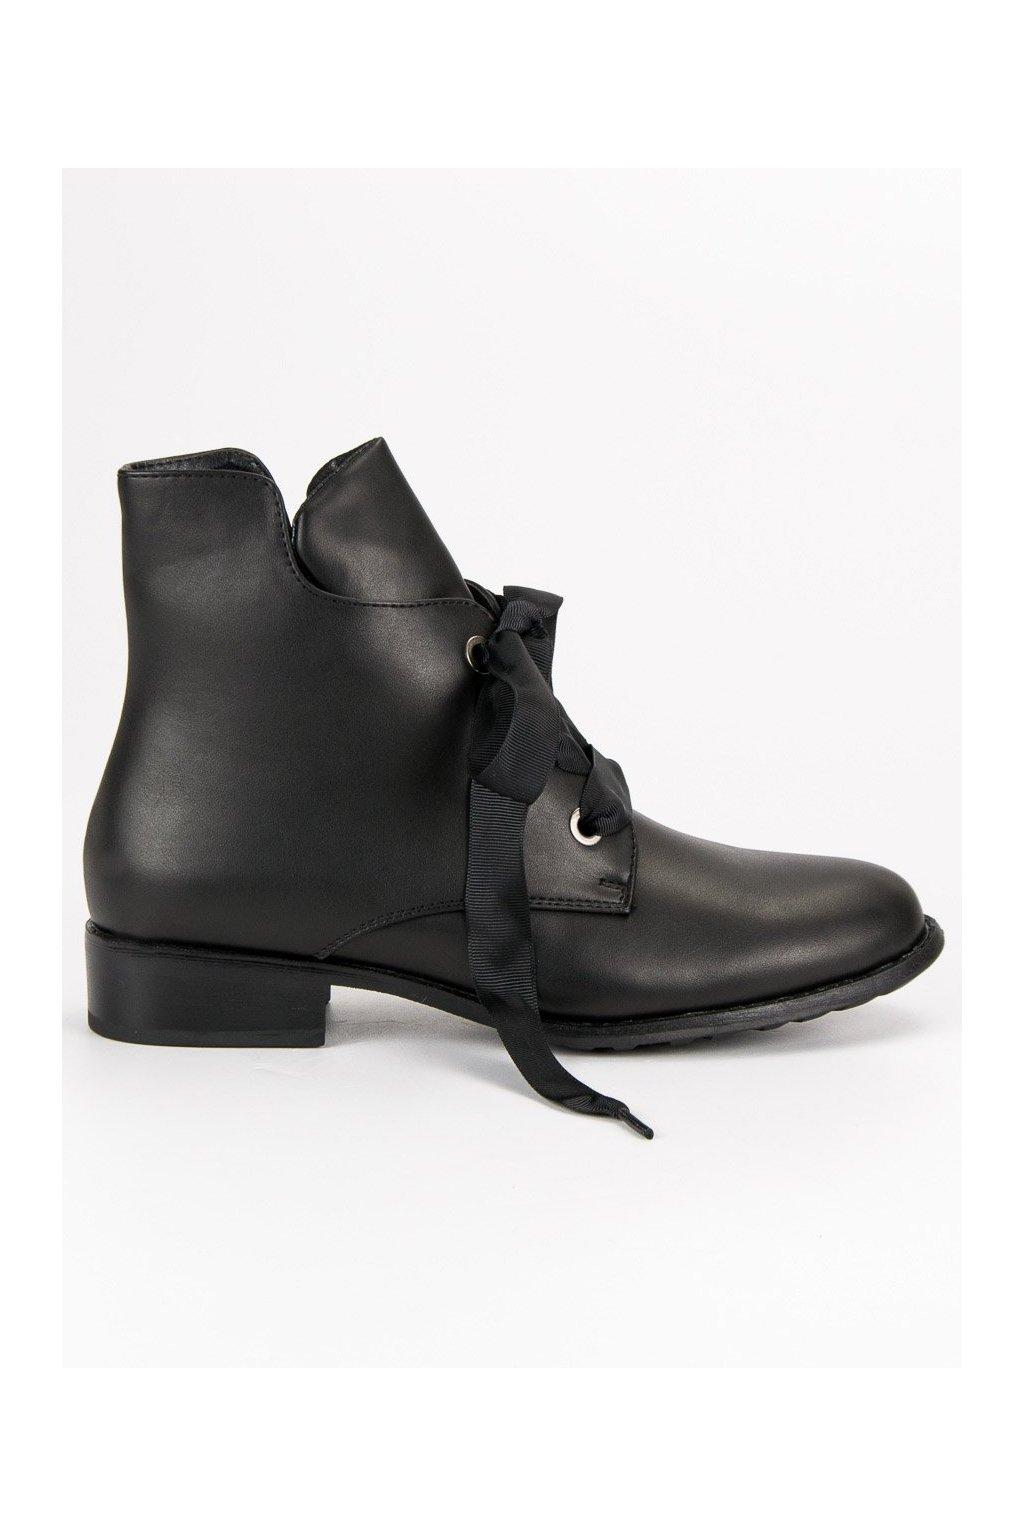 0dd2b6164f58 Výpredaj Zimná obuv